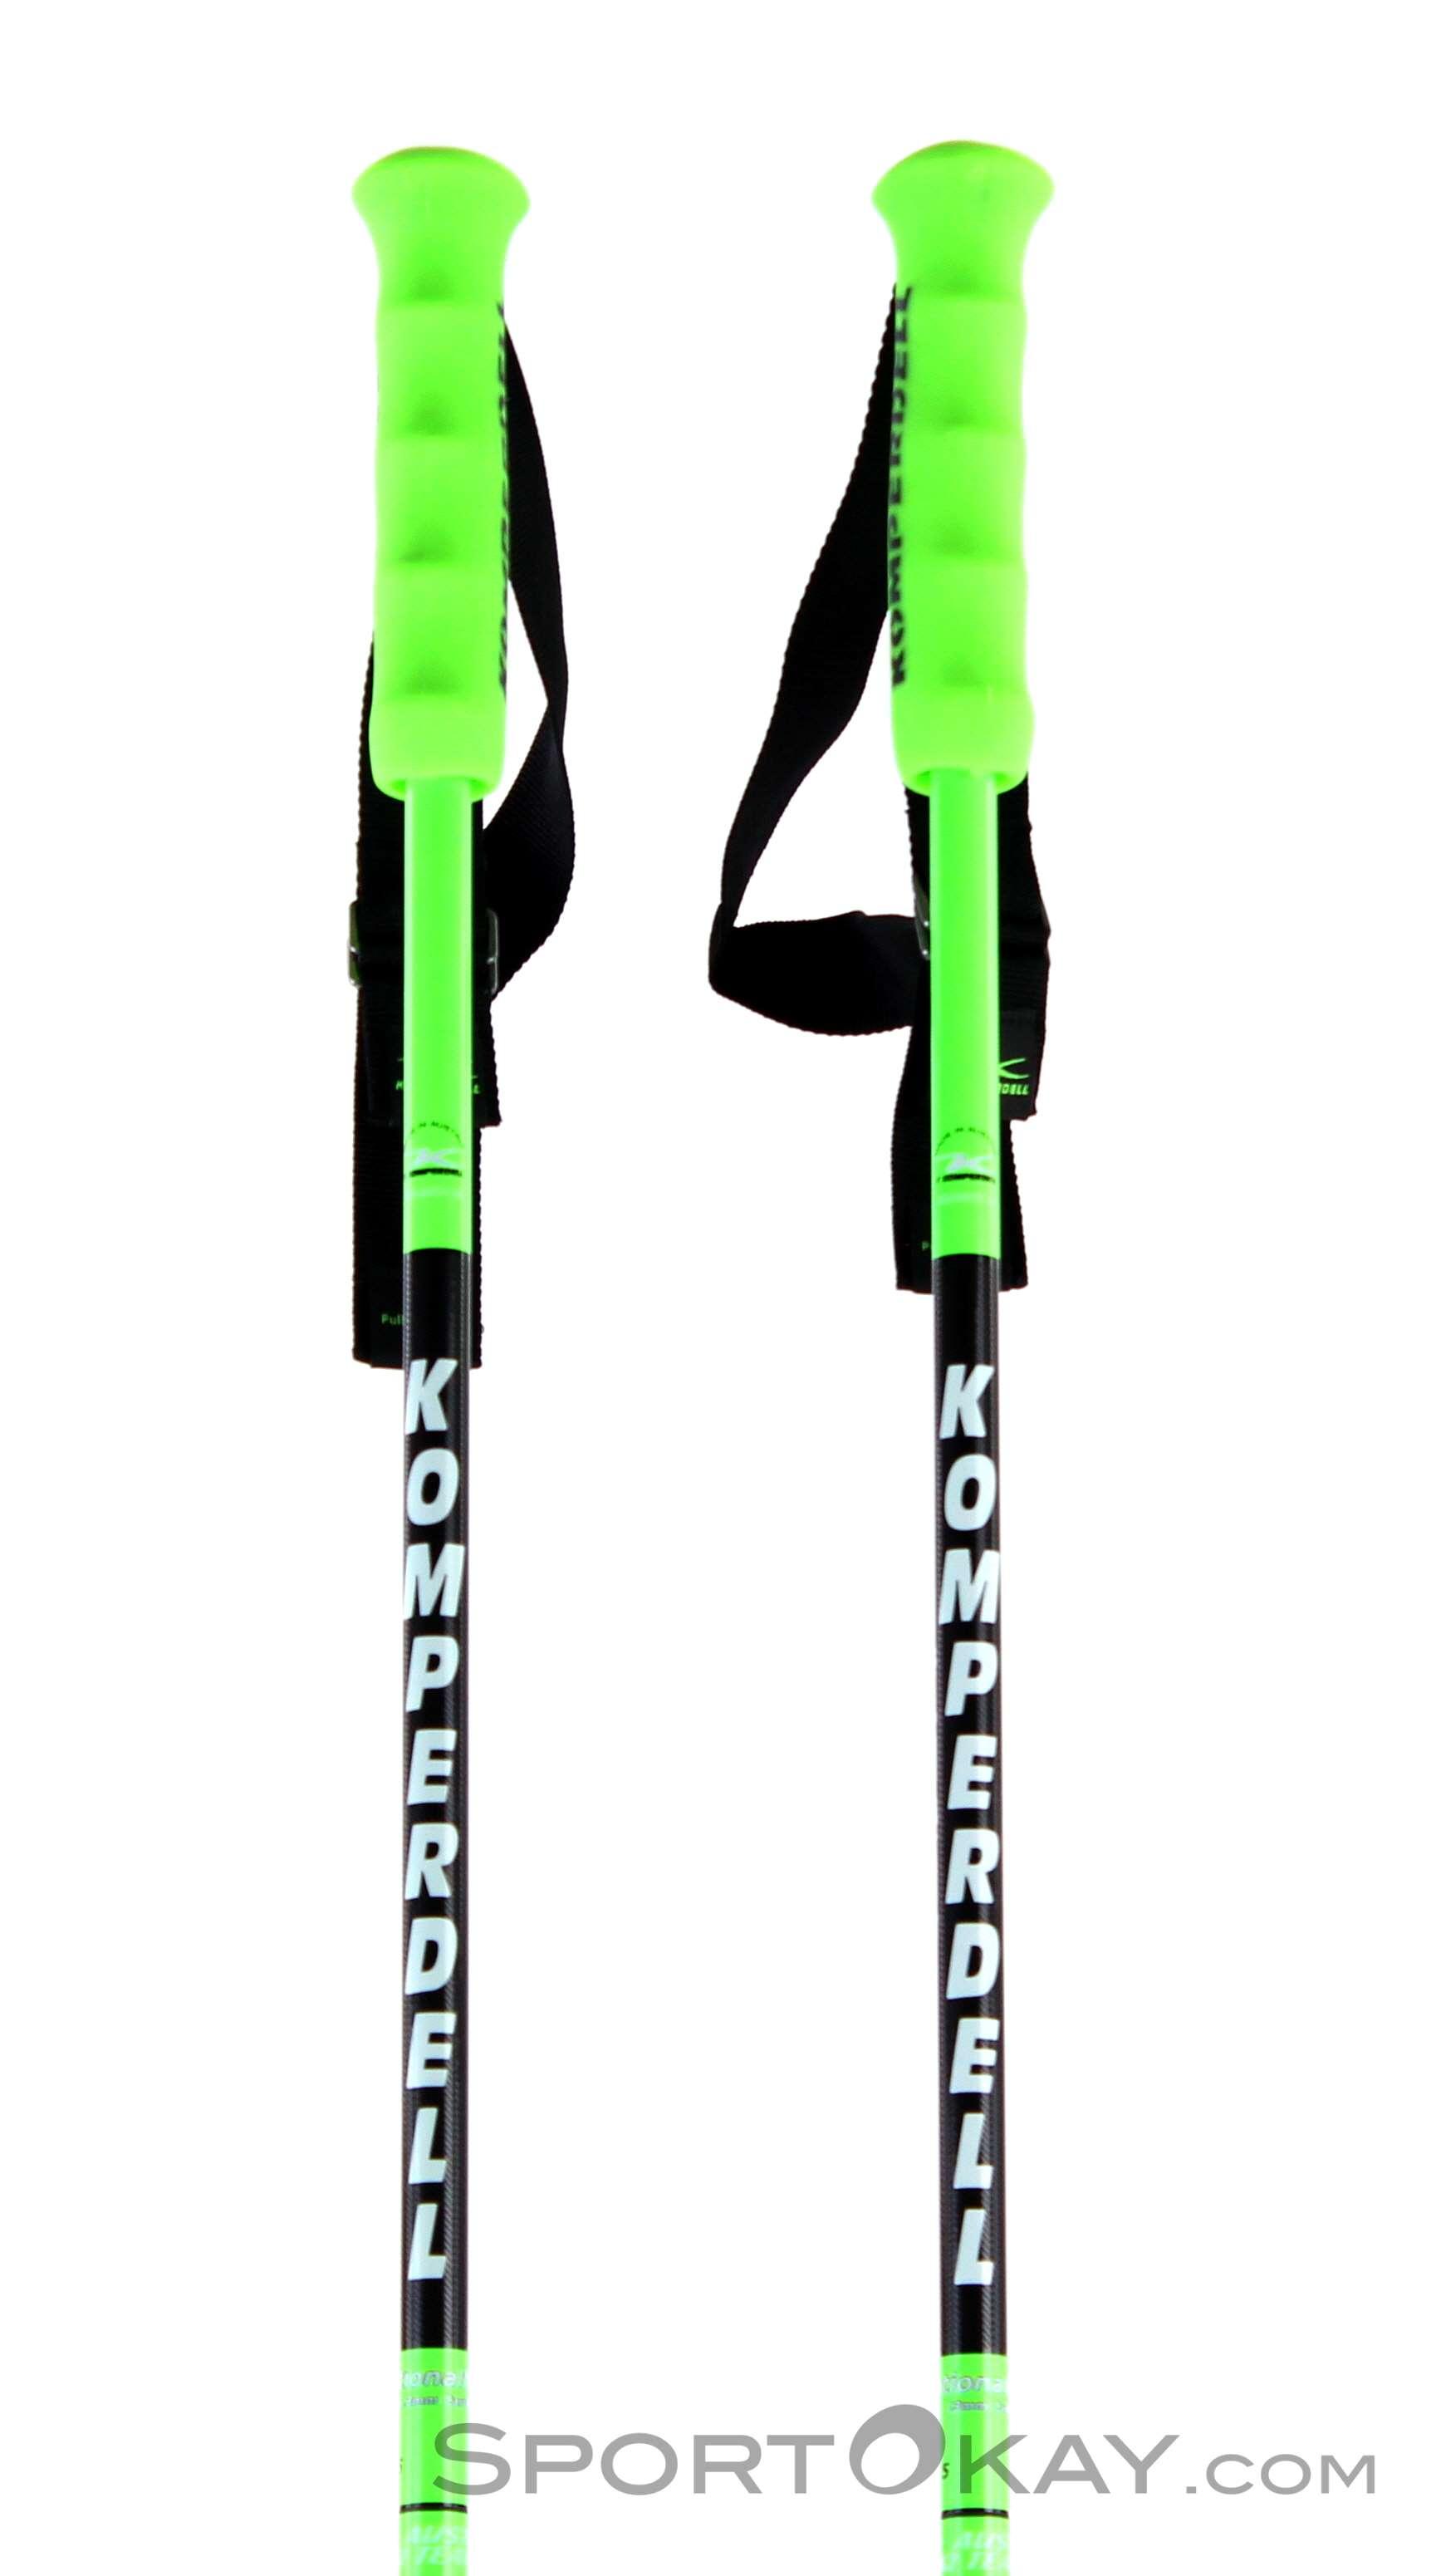 Komperdell Nationalteam Carbon Skistöcke-Grün-110